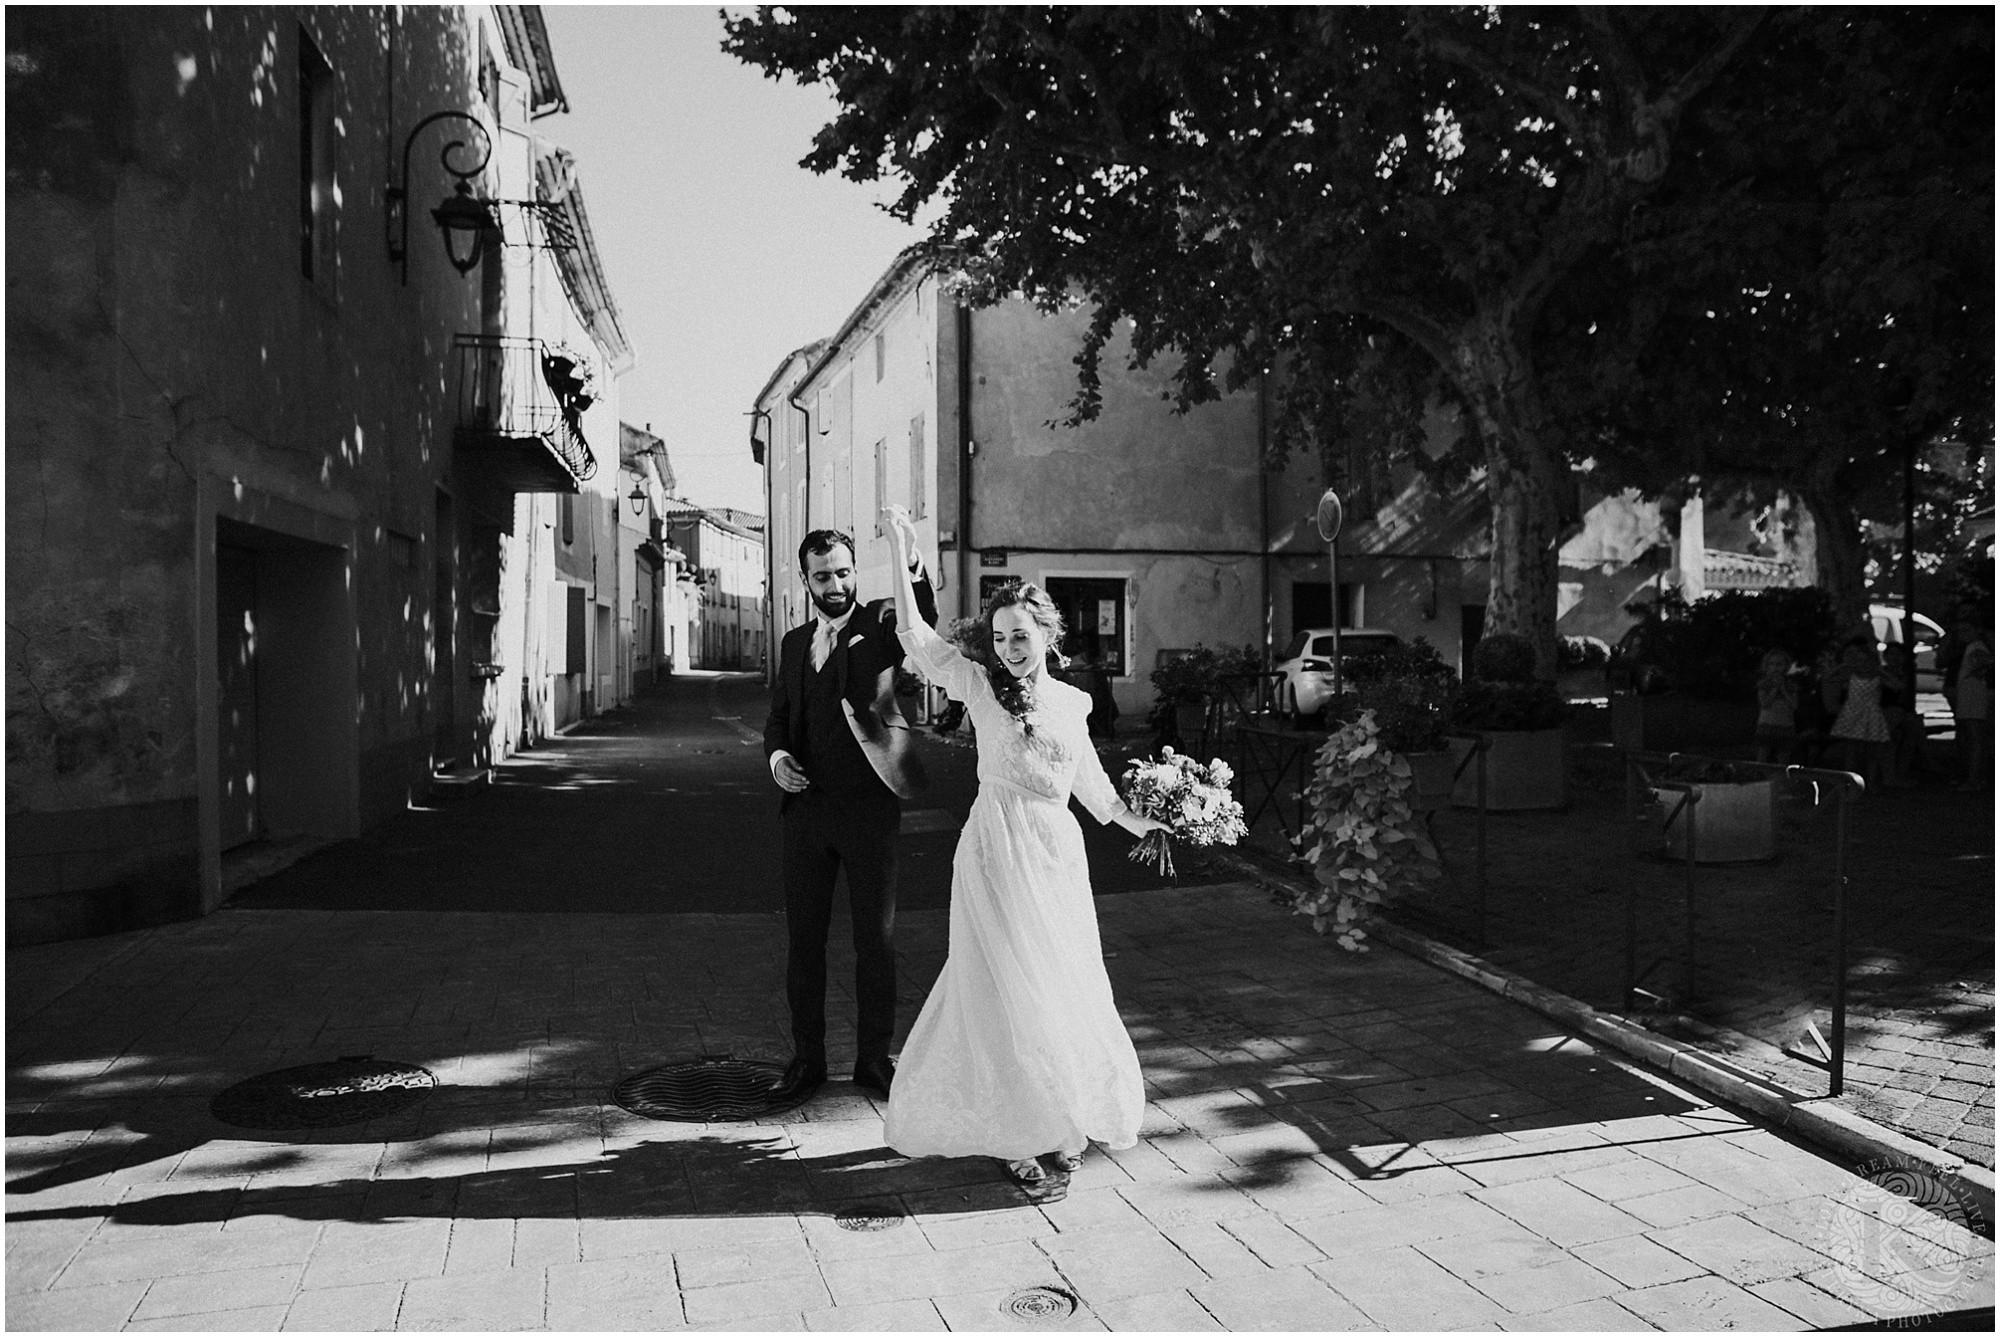 Kateryna-photos-photographe-mariage-vaucluse-provence-avignon-ferme-st-hugues_0053.jpg